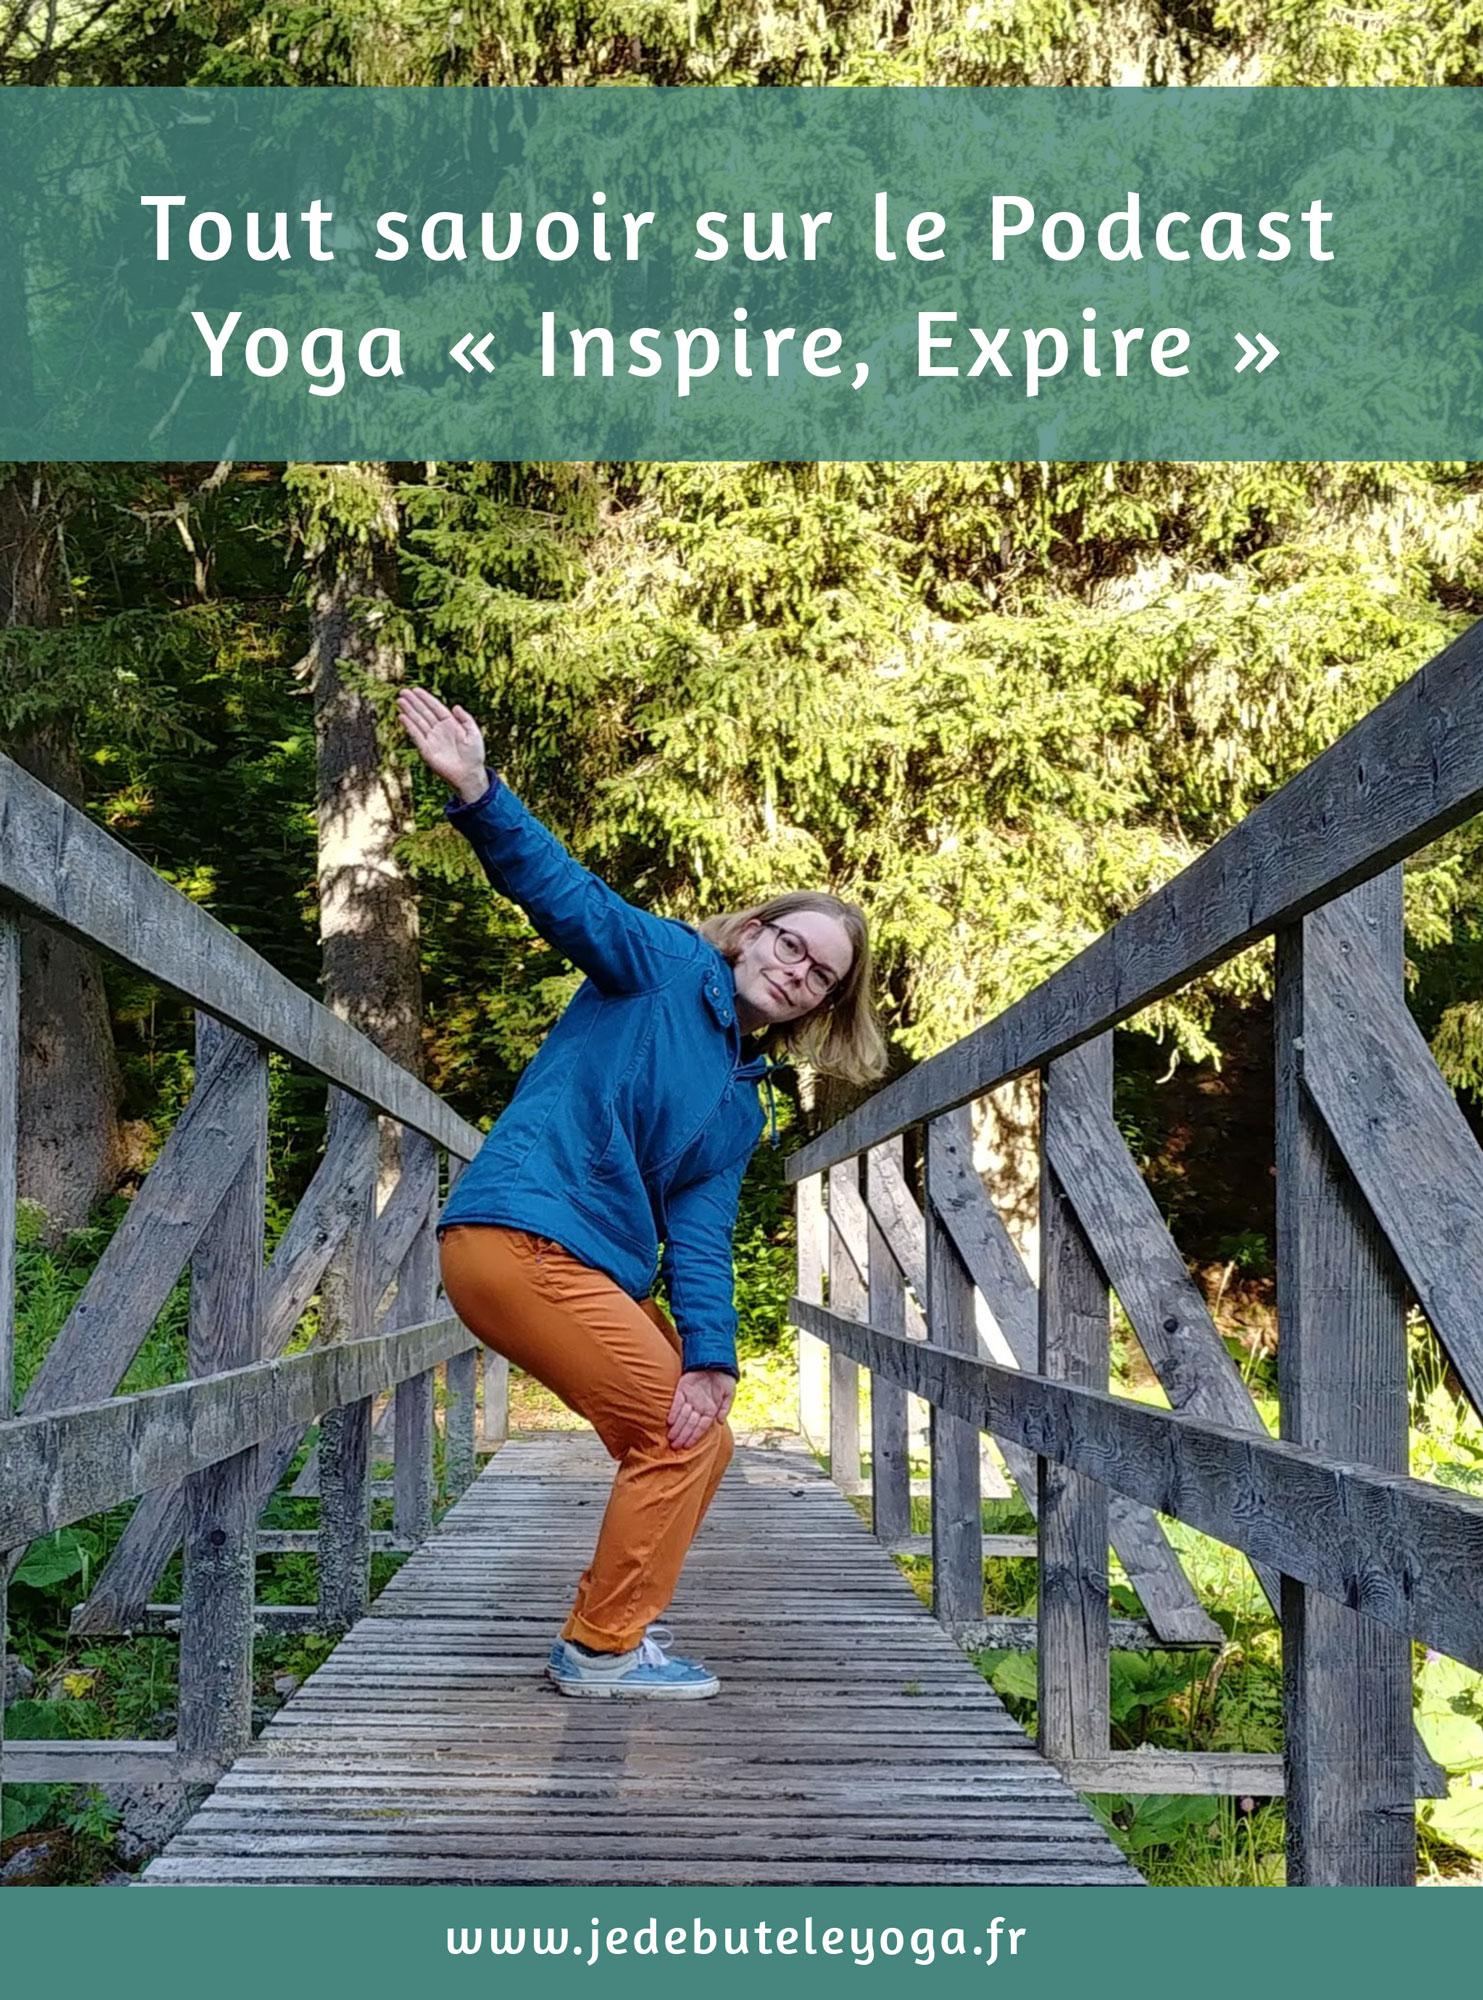 podcast yoga inspire expire